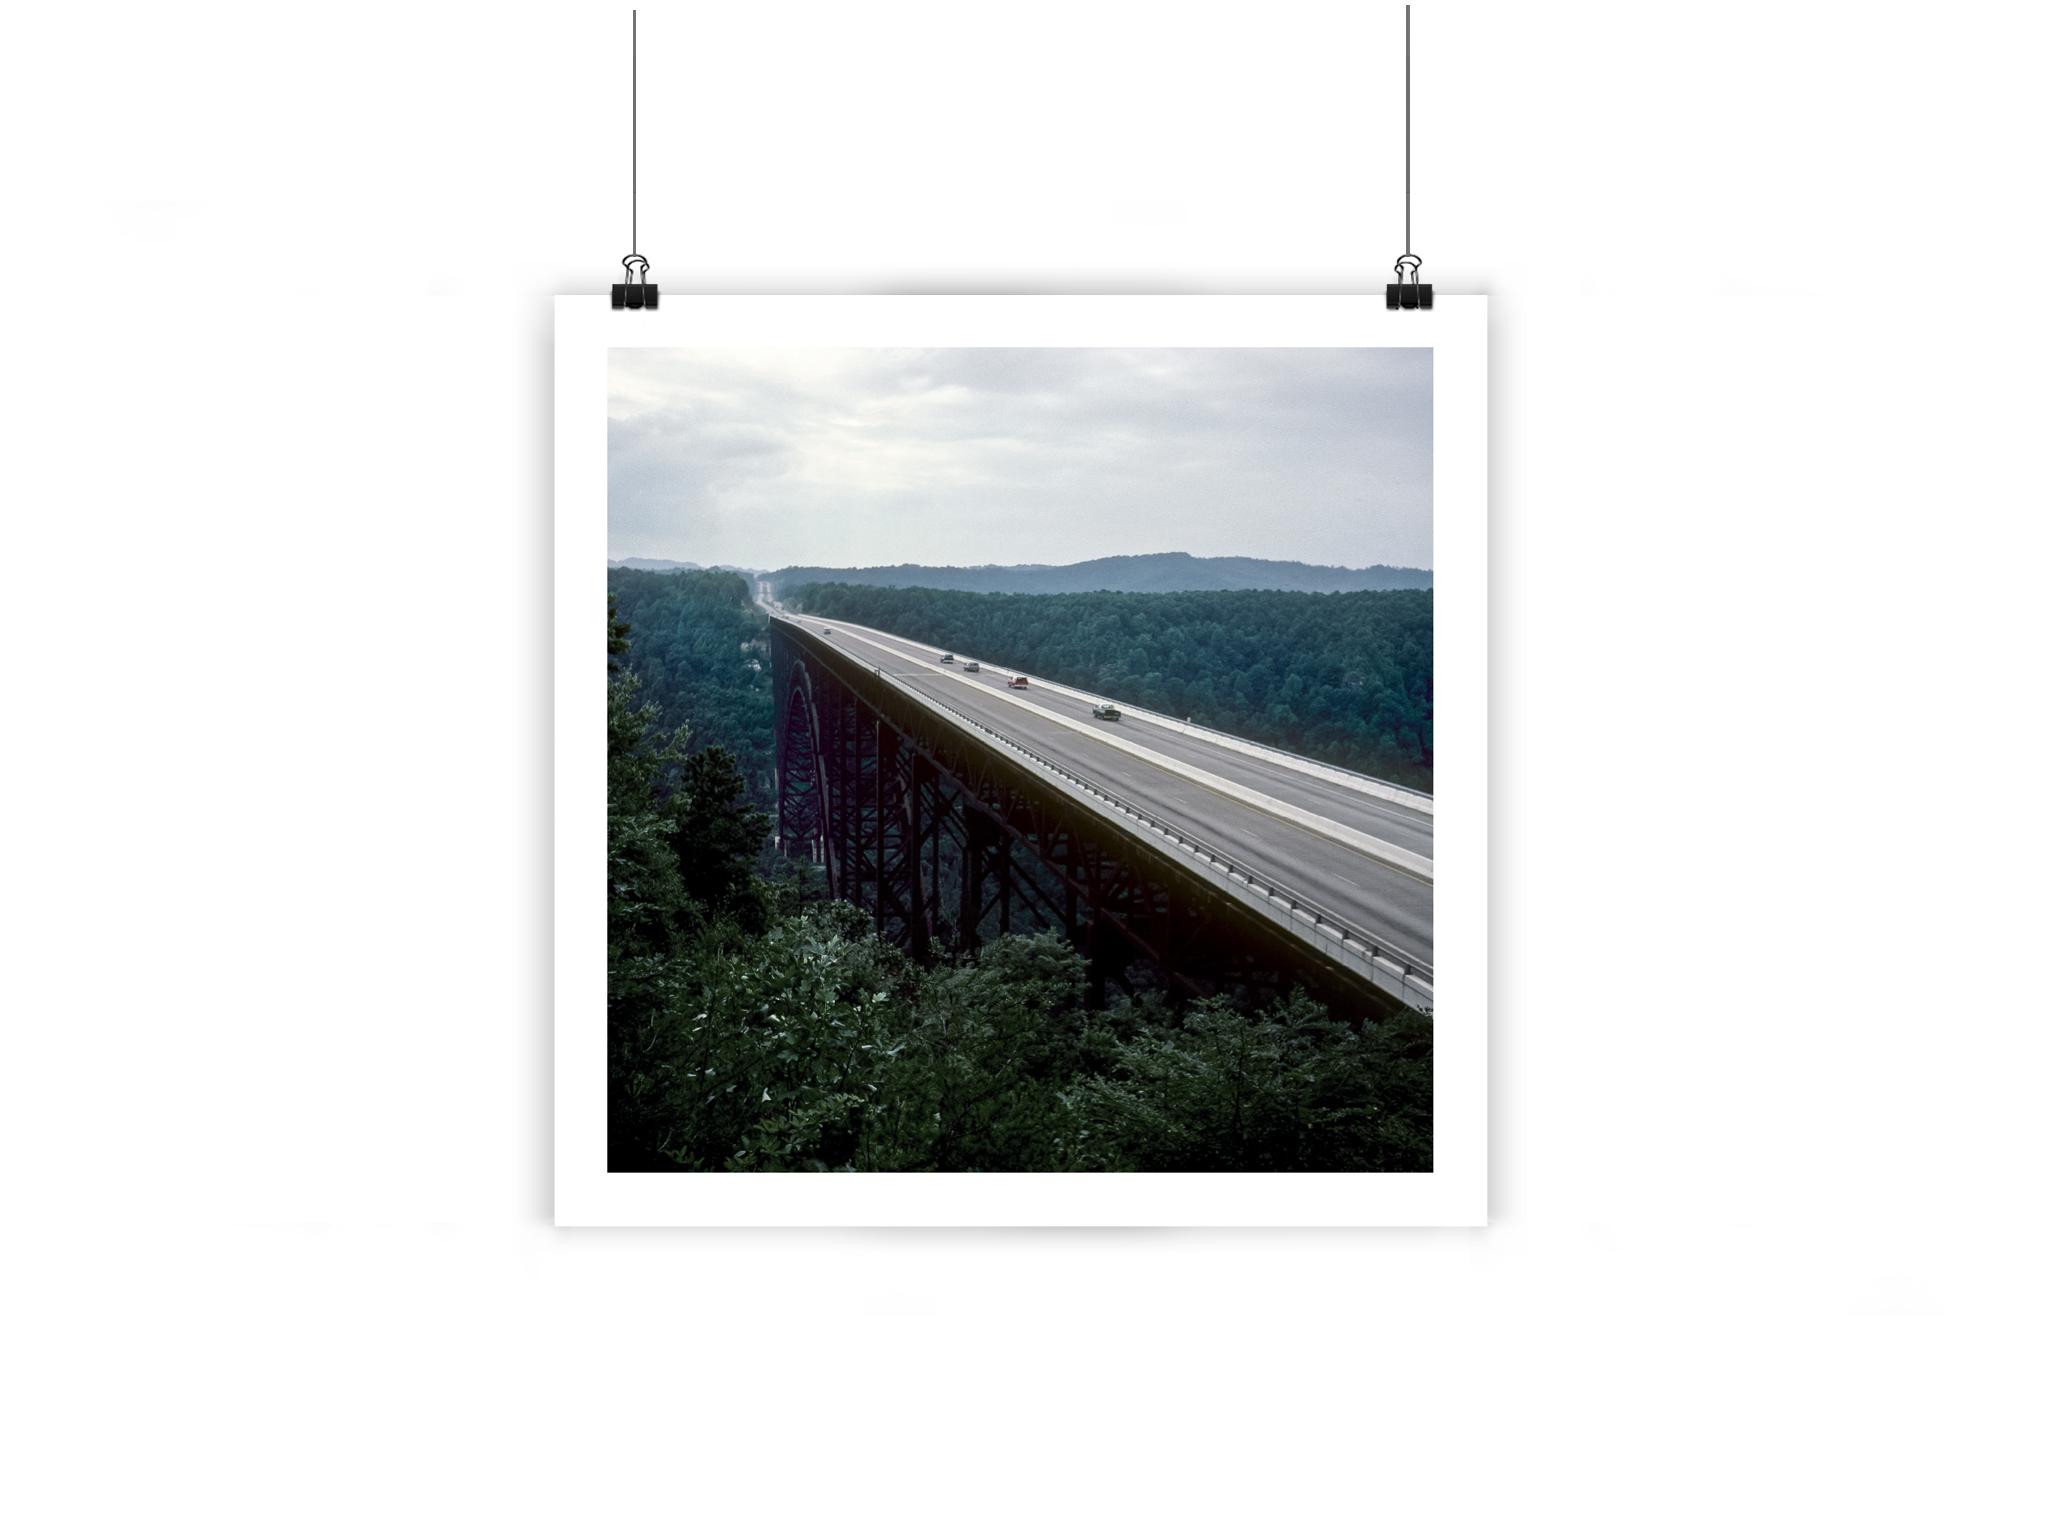 The Bridge 50x50.jpg